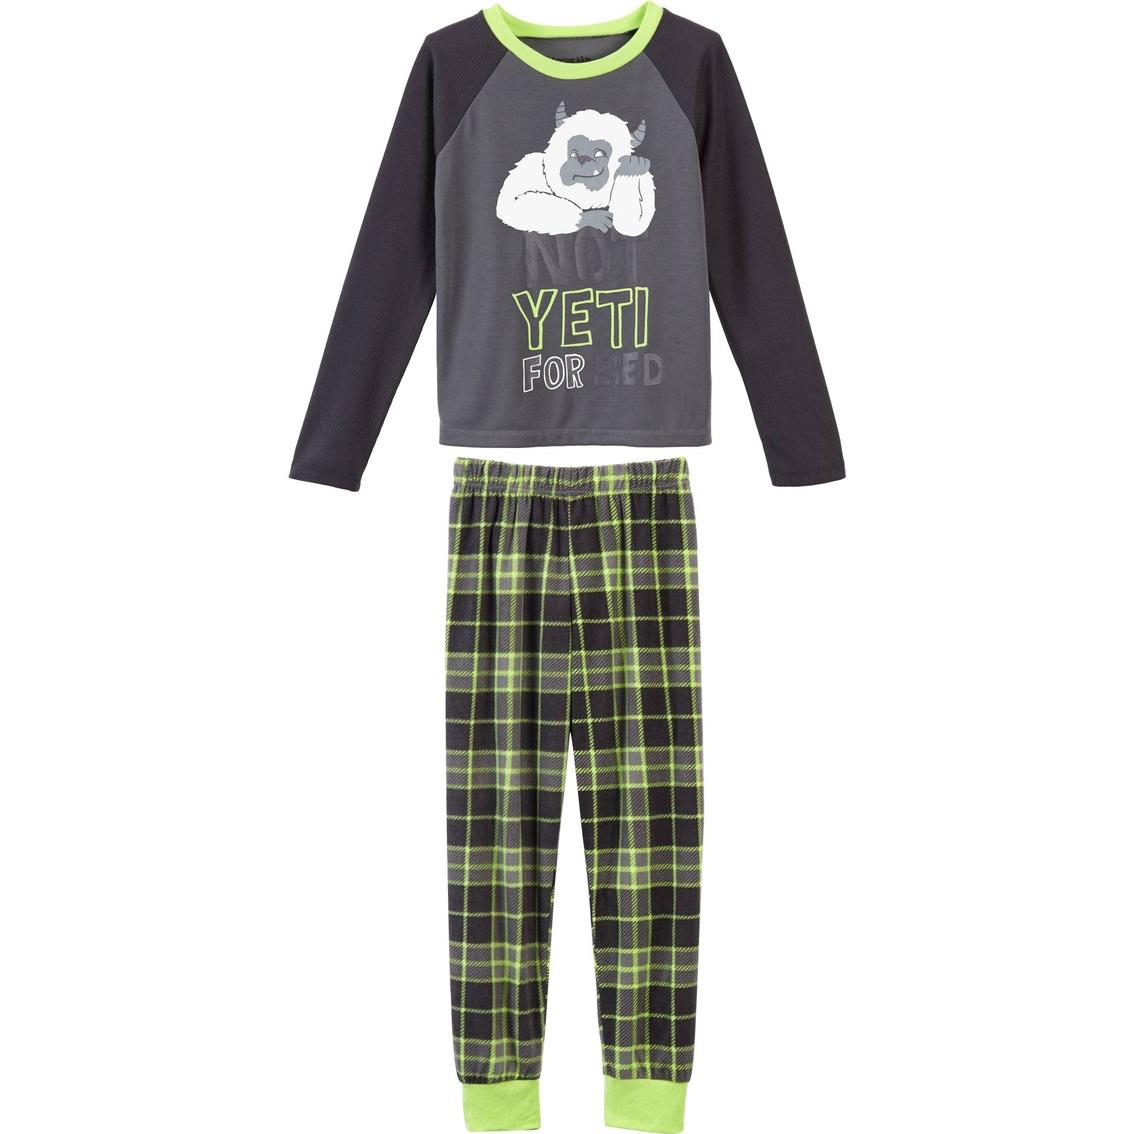 Komar Kids Little Boys 2 Pc. Yeti Pajama Set  035ff655b